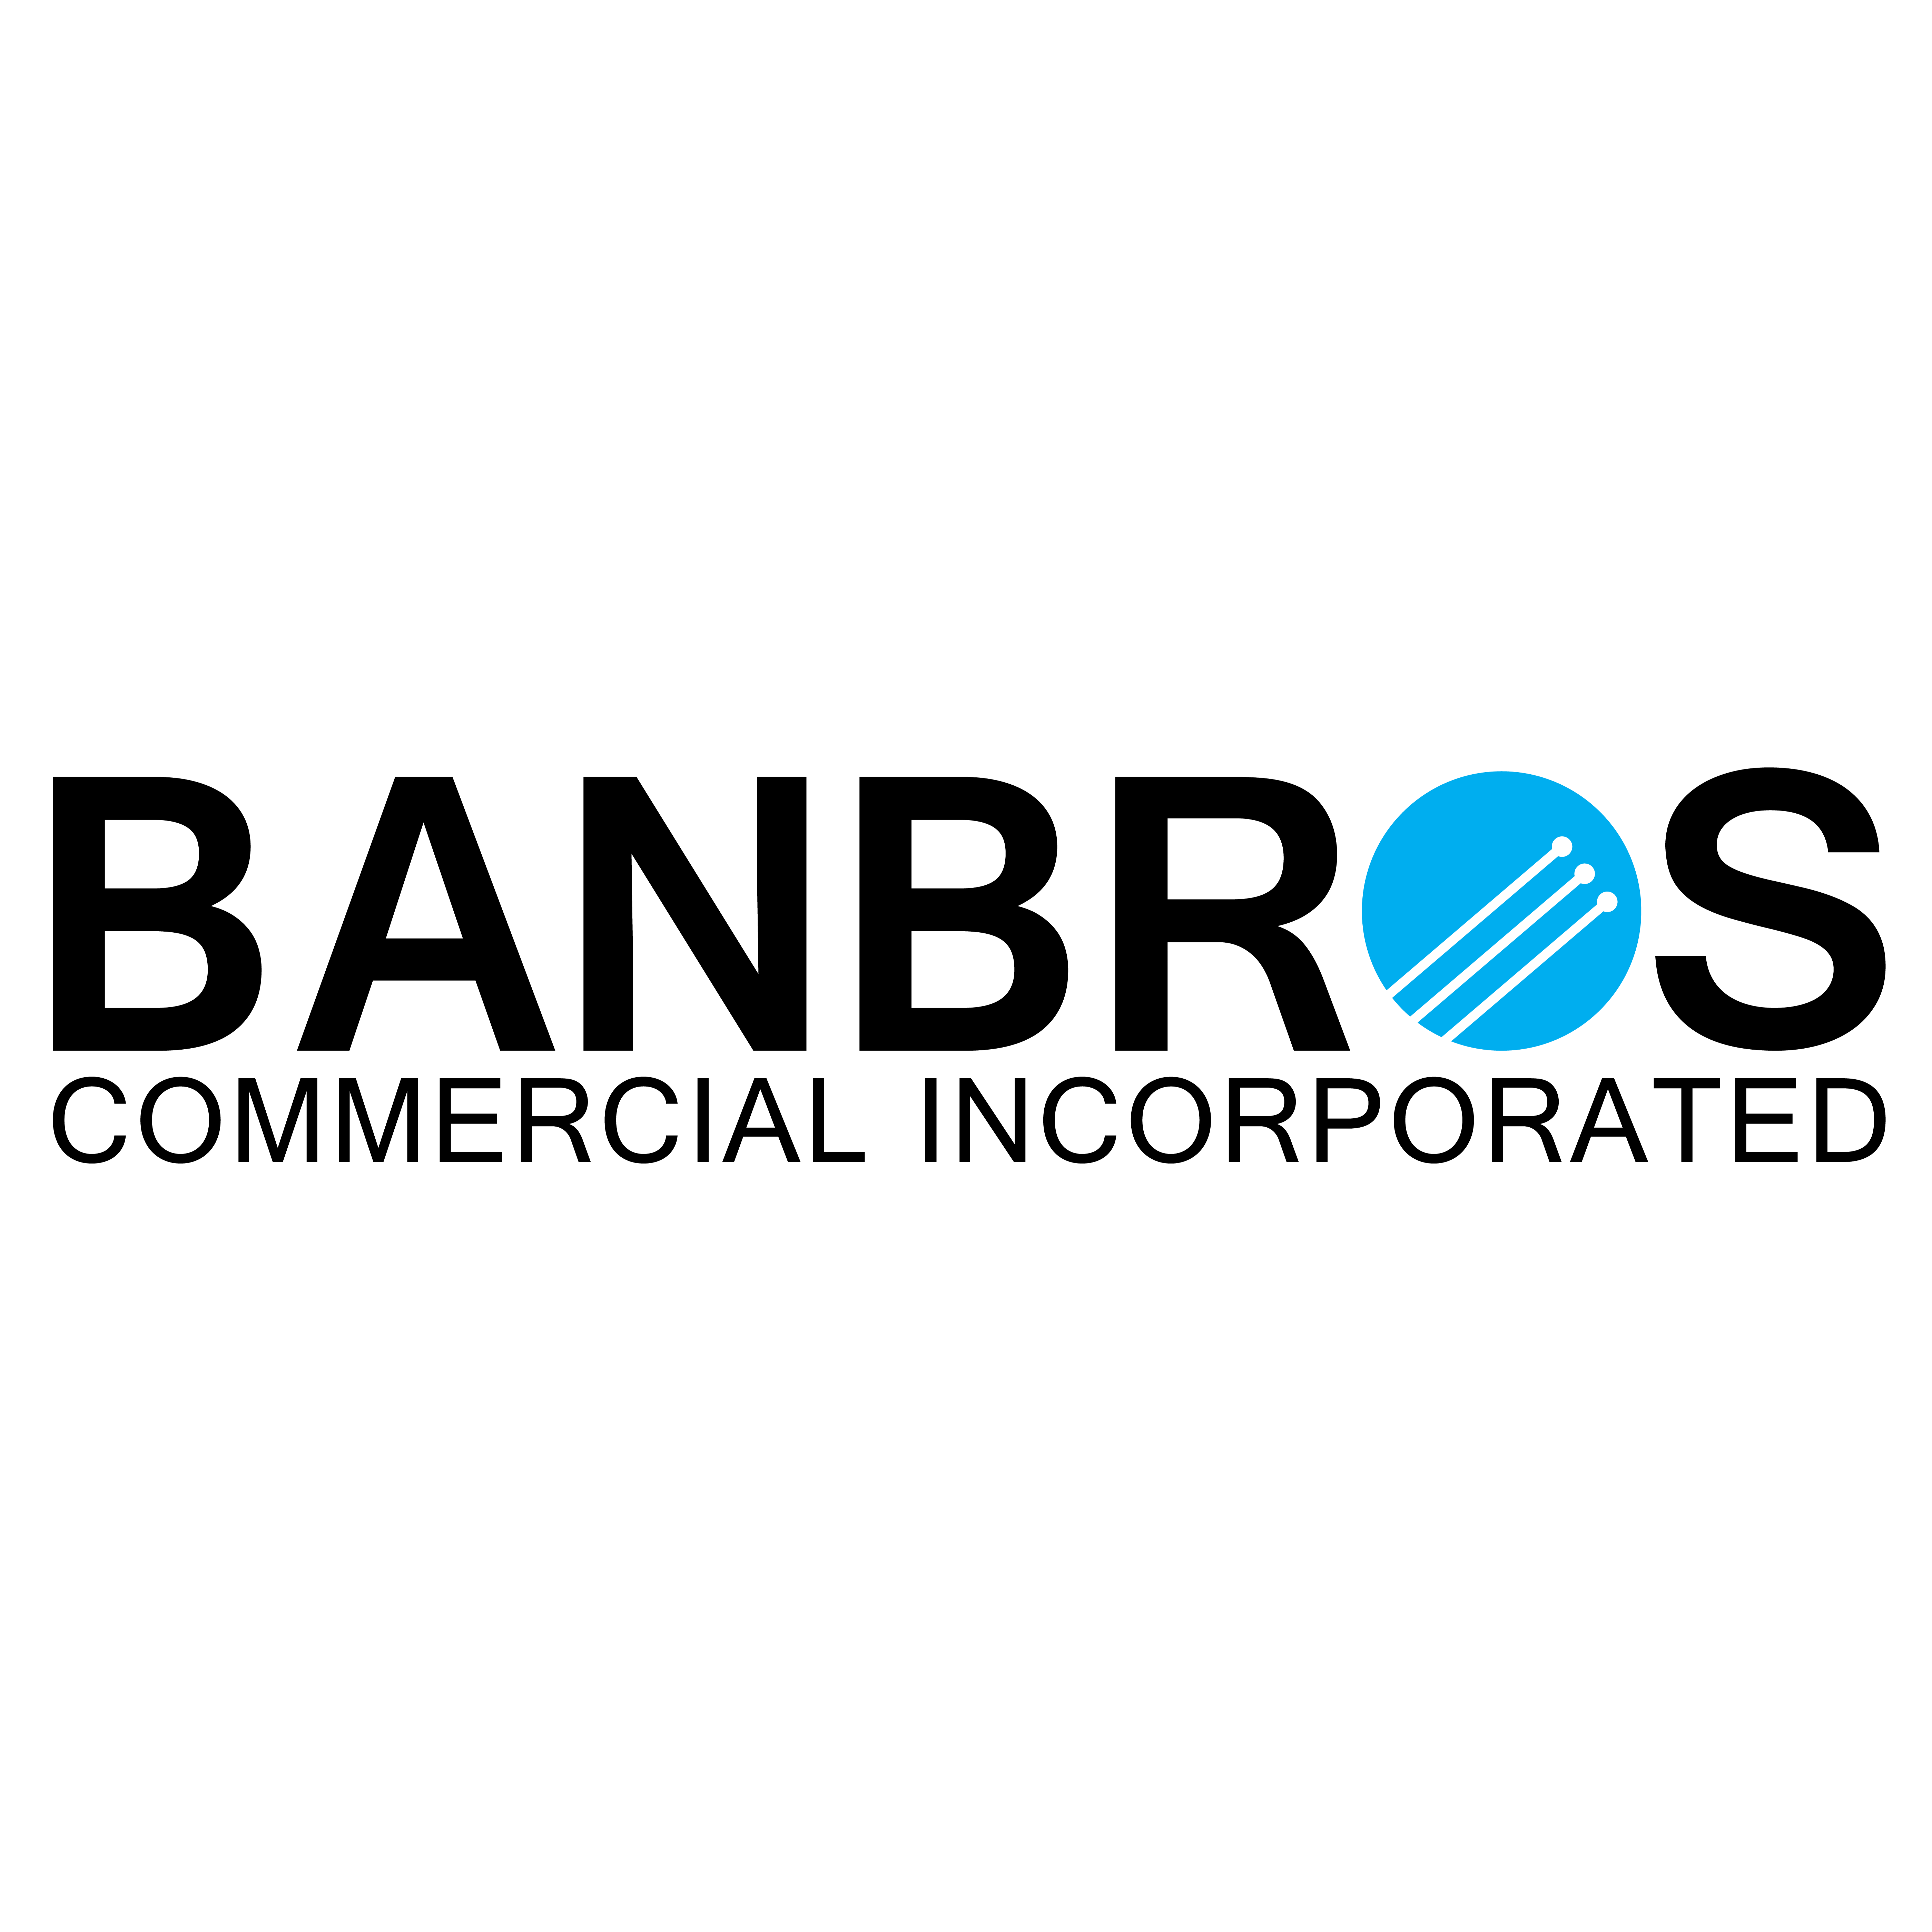 Banbros Commercial, Inc.